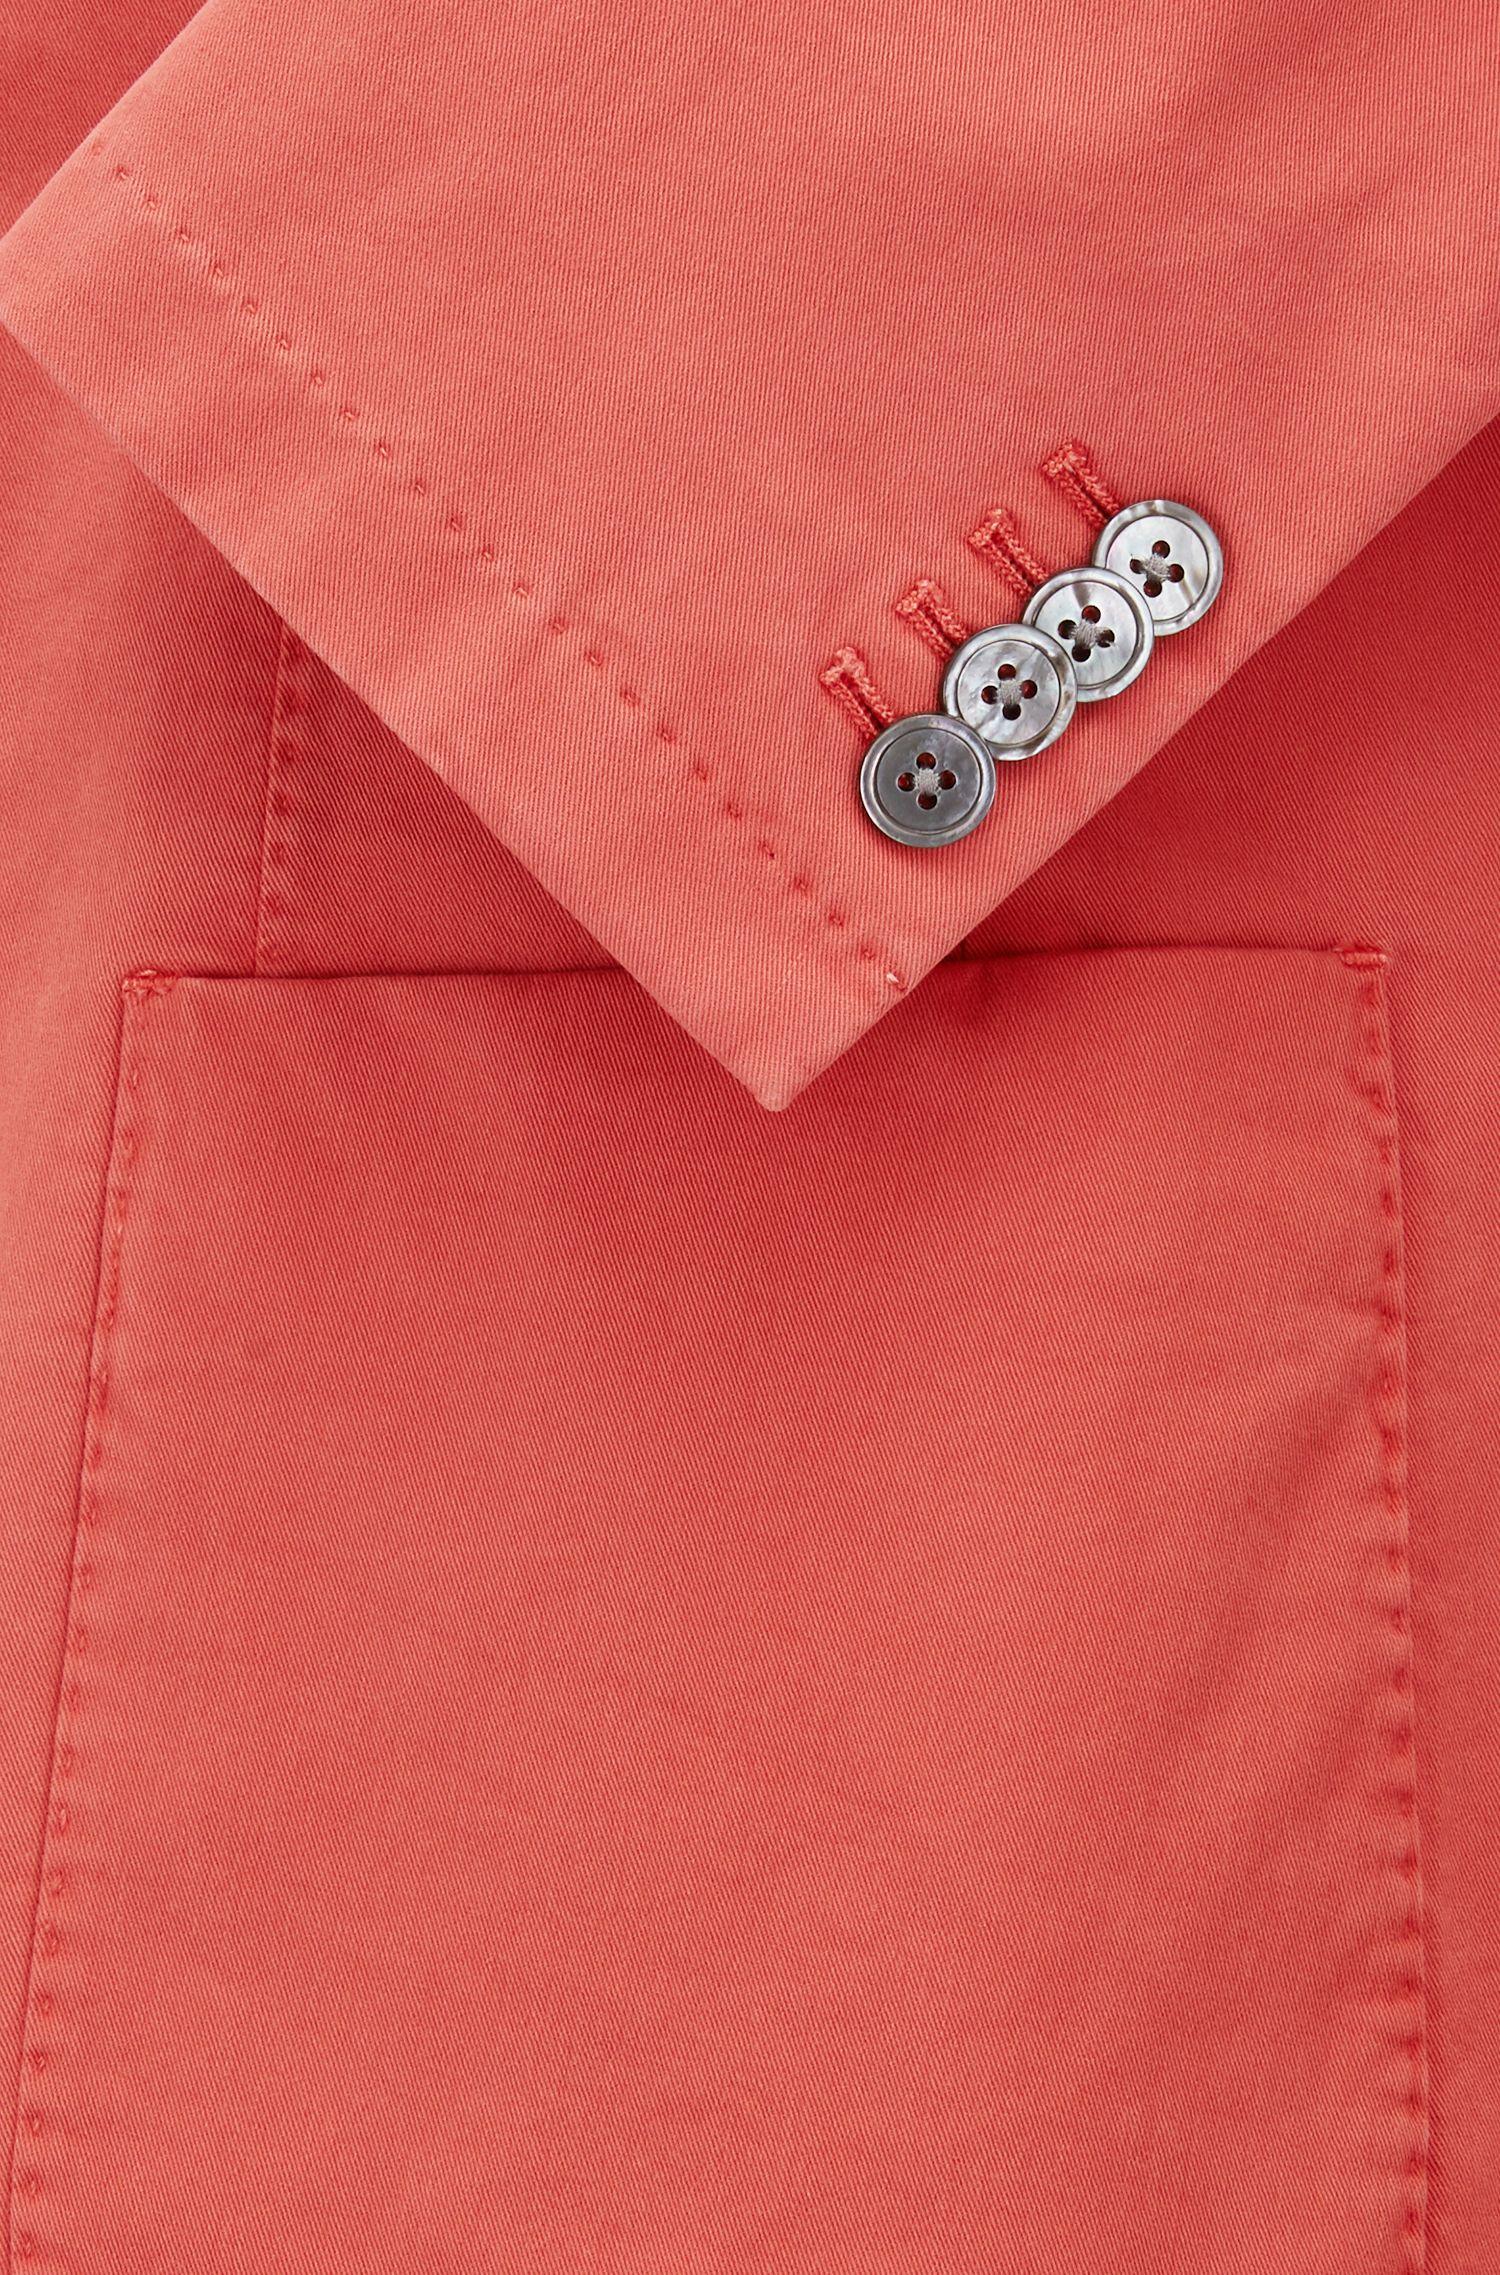 Garment-Dyed Stretch Cotton Sport Coat, Slim Fit | Hanry D